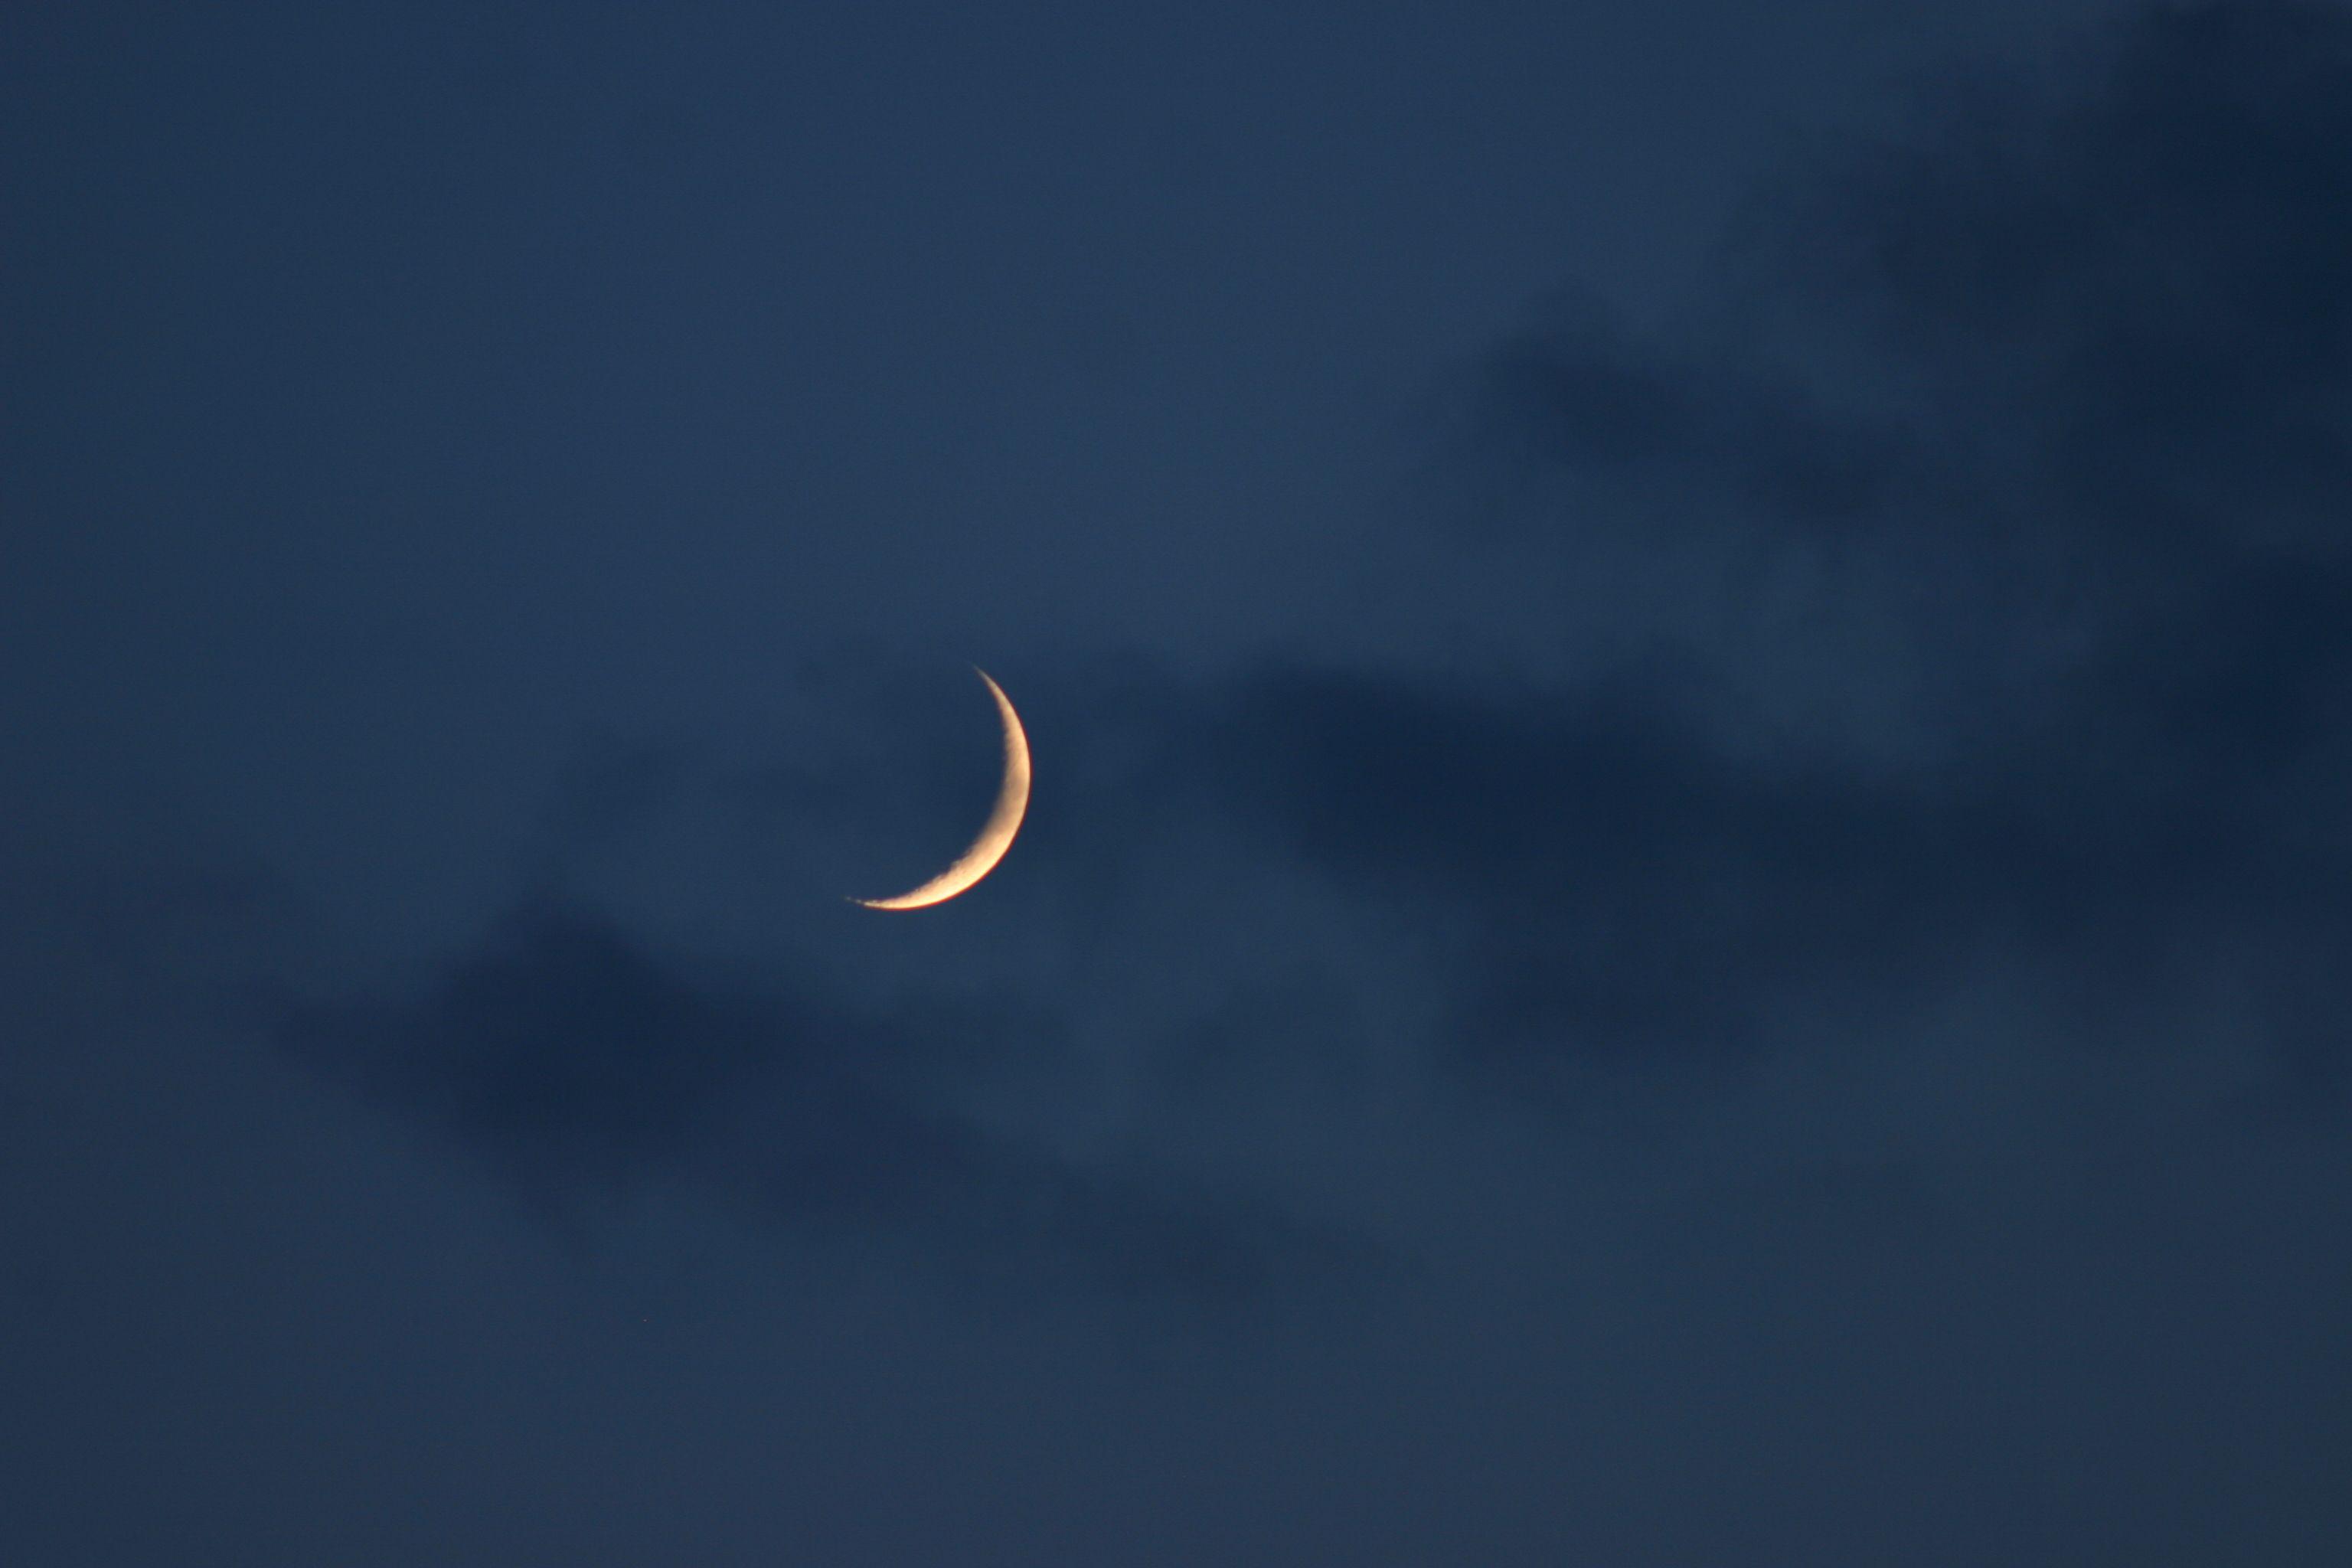 Crescent Moon Pinterest Pandeamonium Moon Photography Sky Aesthetic Moon